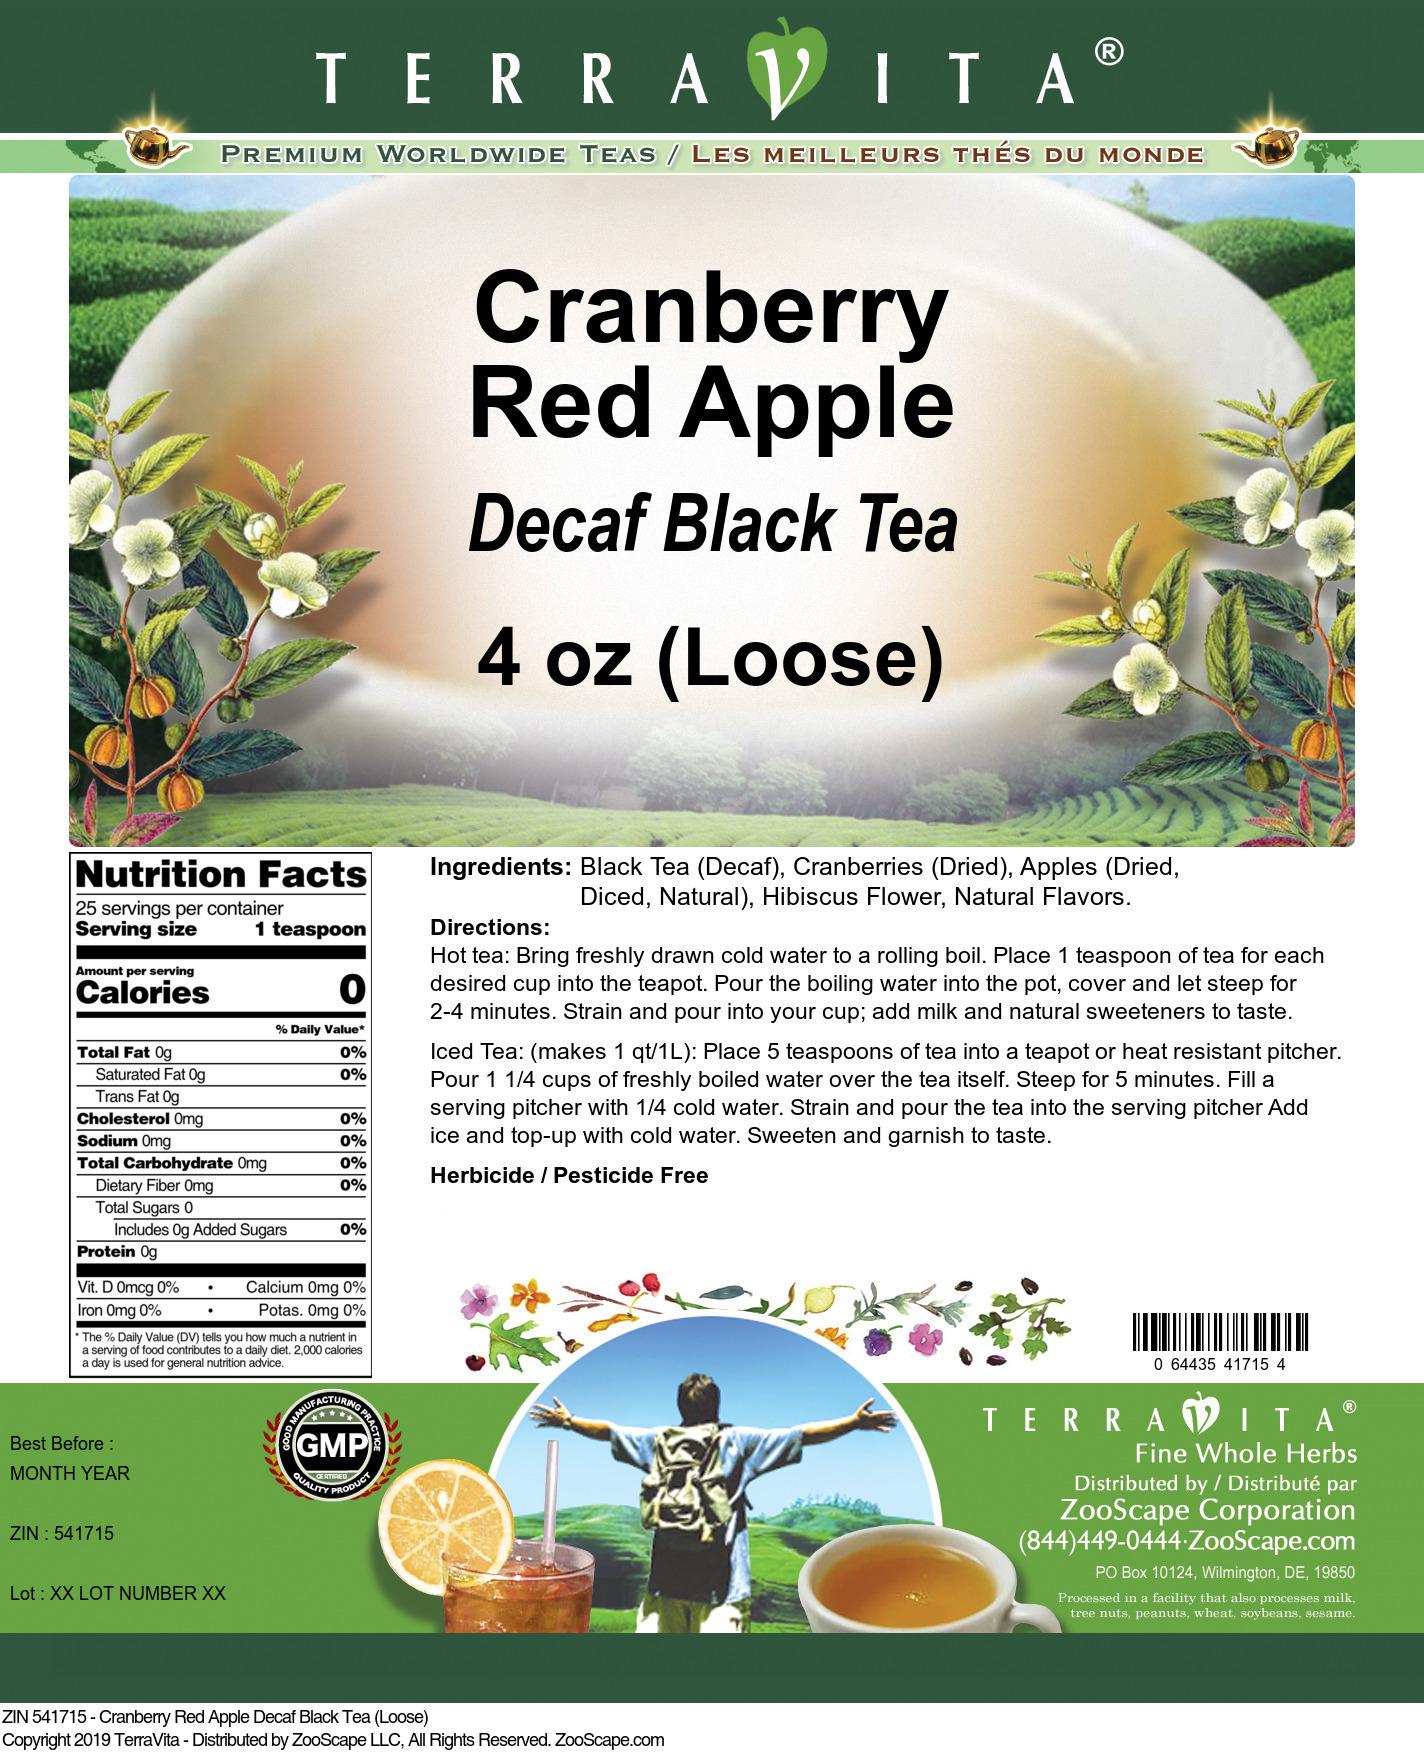 Cranberry Red Apple Decaf Black Tea (Loose)